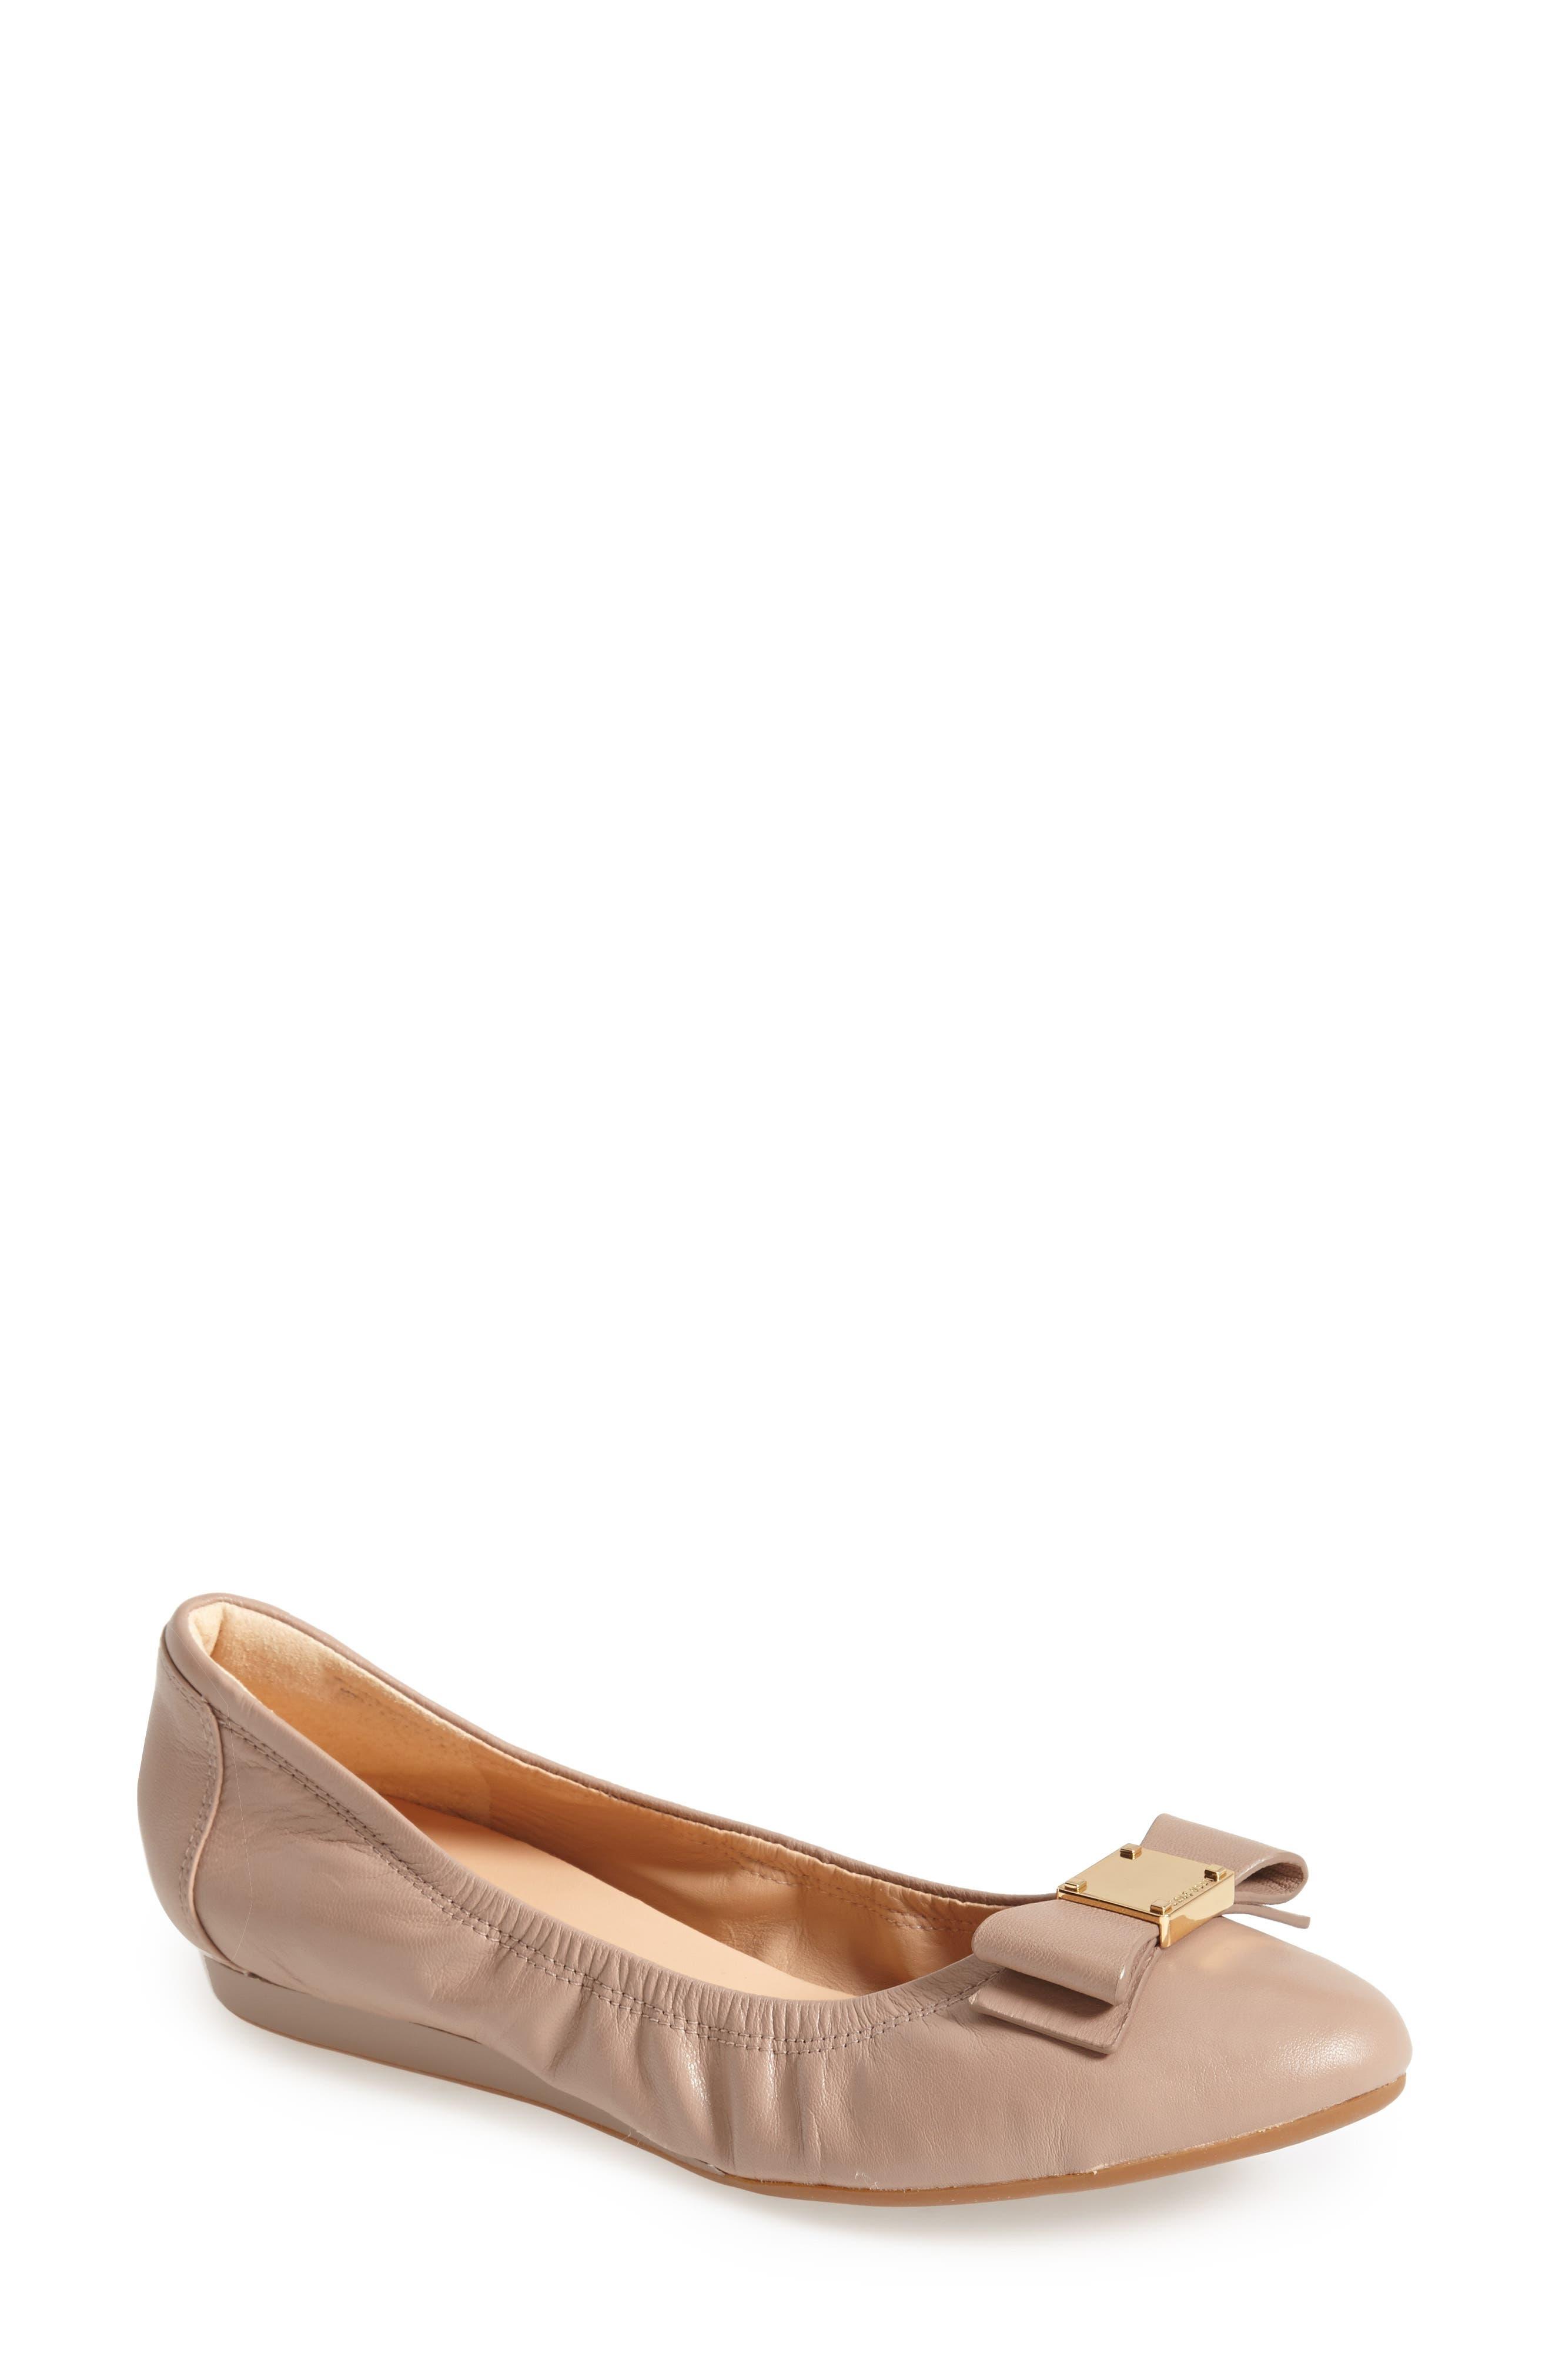 'Tali' Bow Ballet Flat,                             Main thumbnail 1, color,                             Maple Sugar